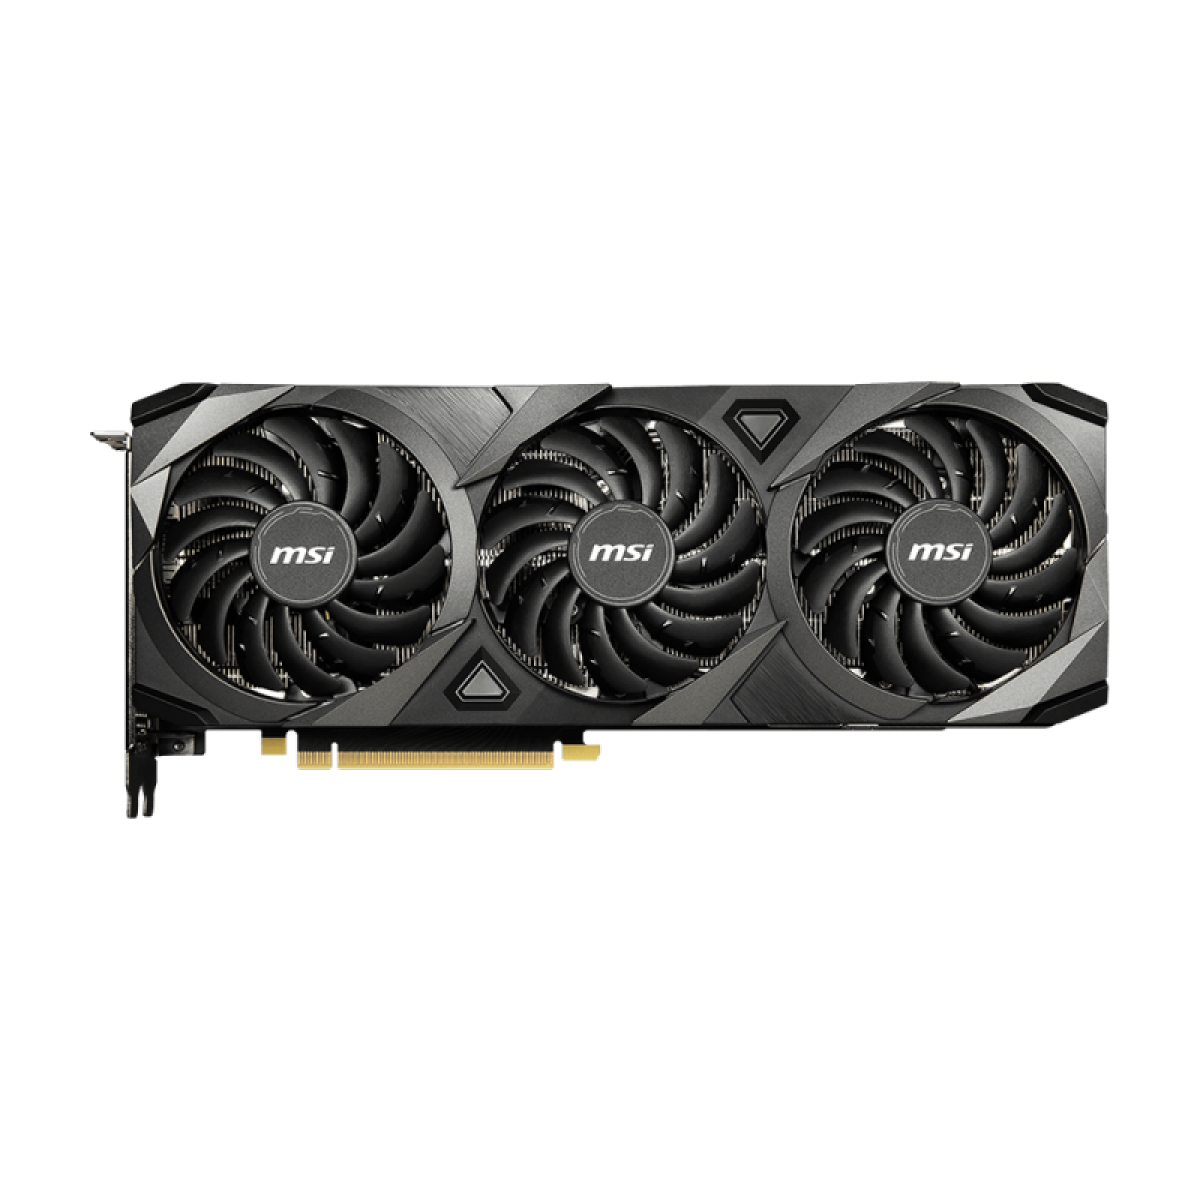 Placa de Vídeo MSI, GeForce, RTX 3080 VENTUS 3X, 10GB, GDDR6X, 320Bit